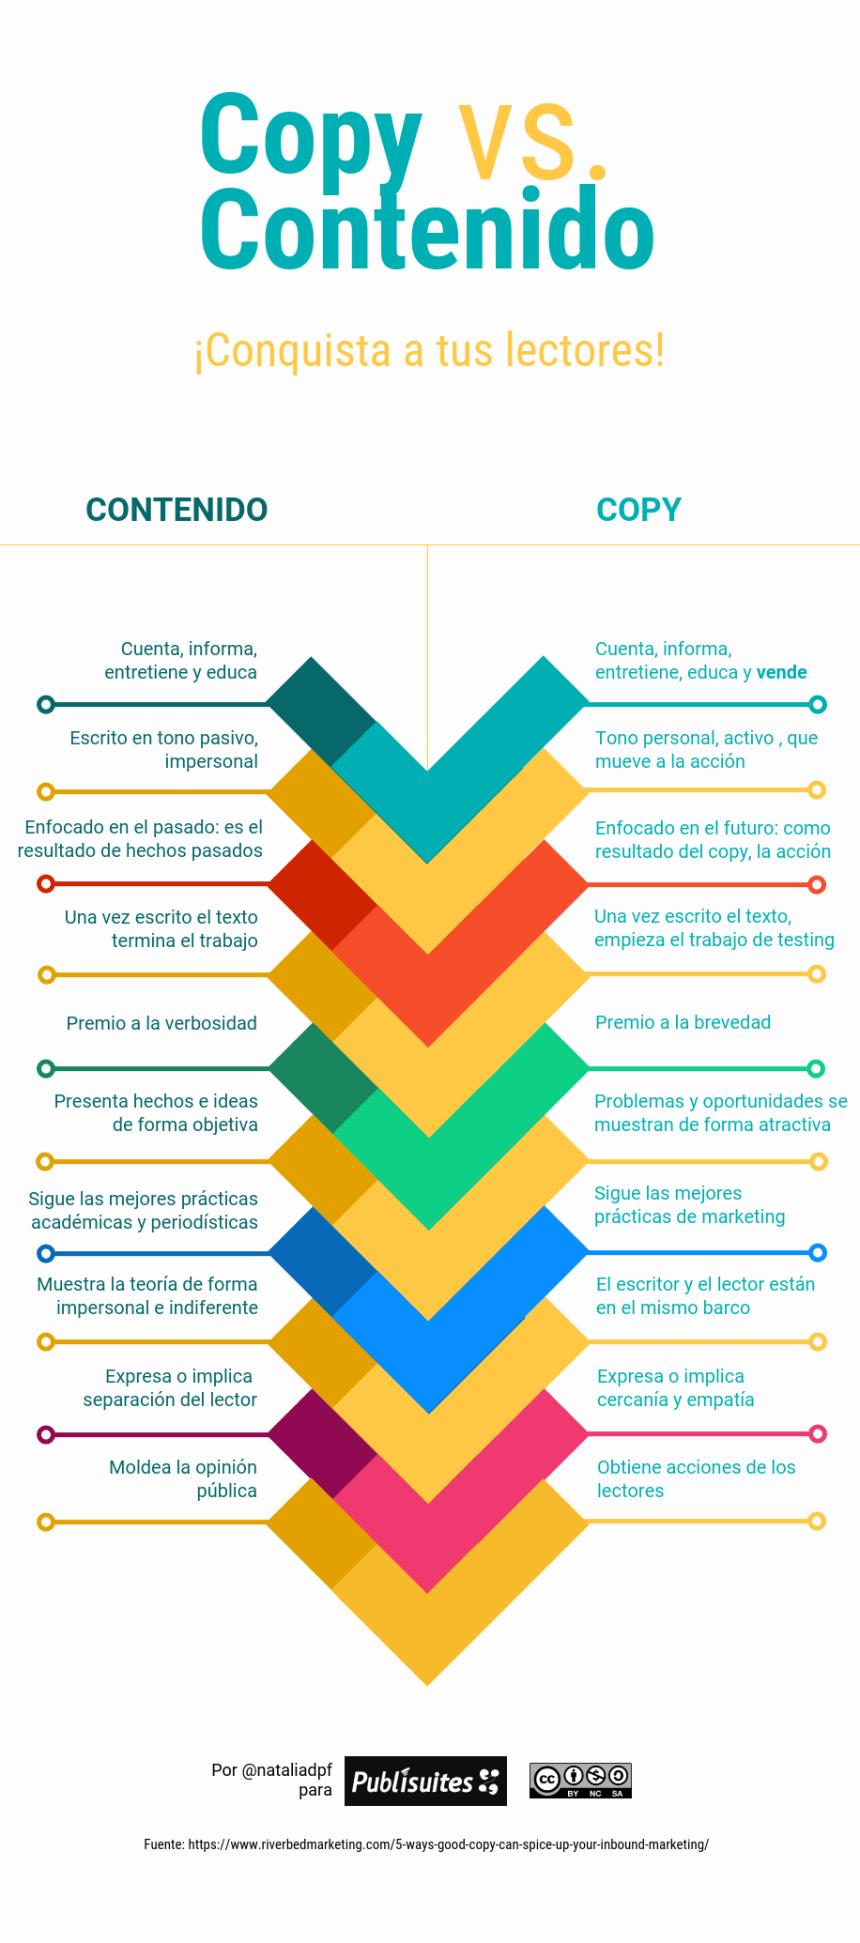 Copy vs Contenido #infografia #infographic #marketing